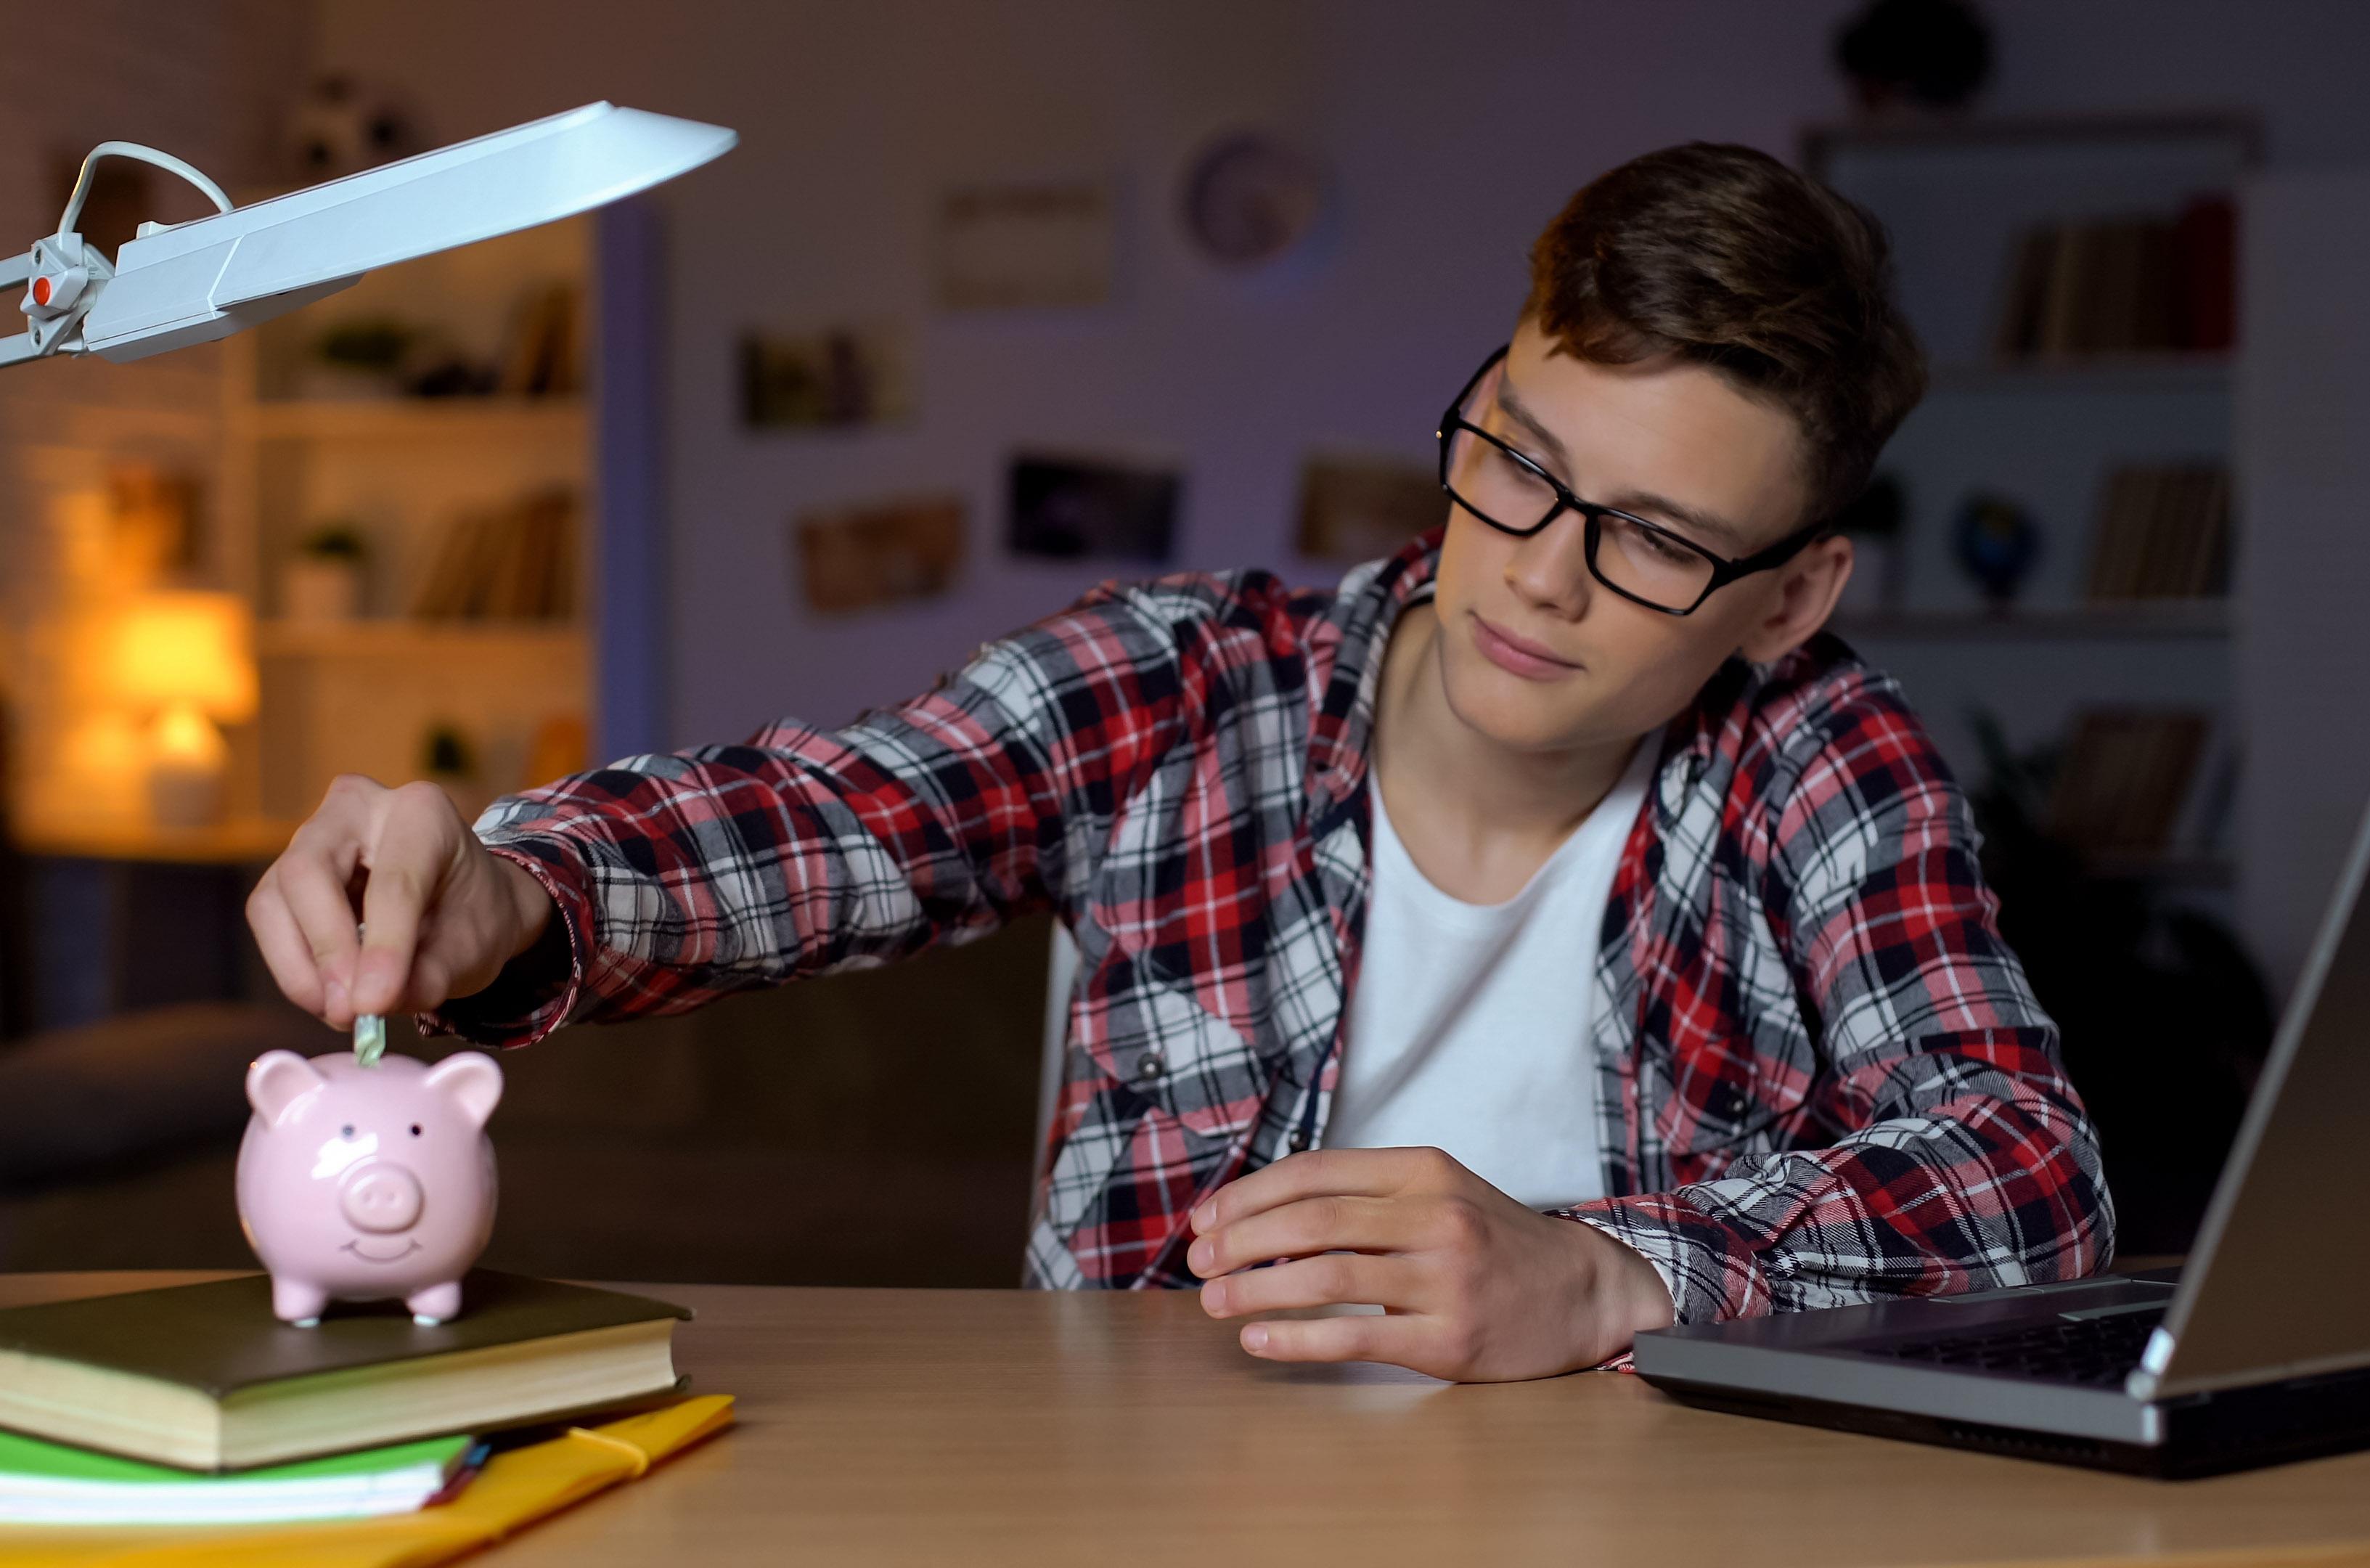 teenager saving coin into piggy bank